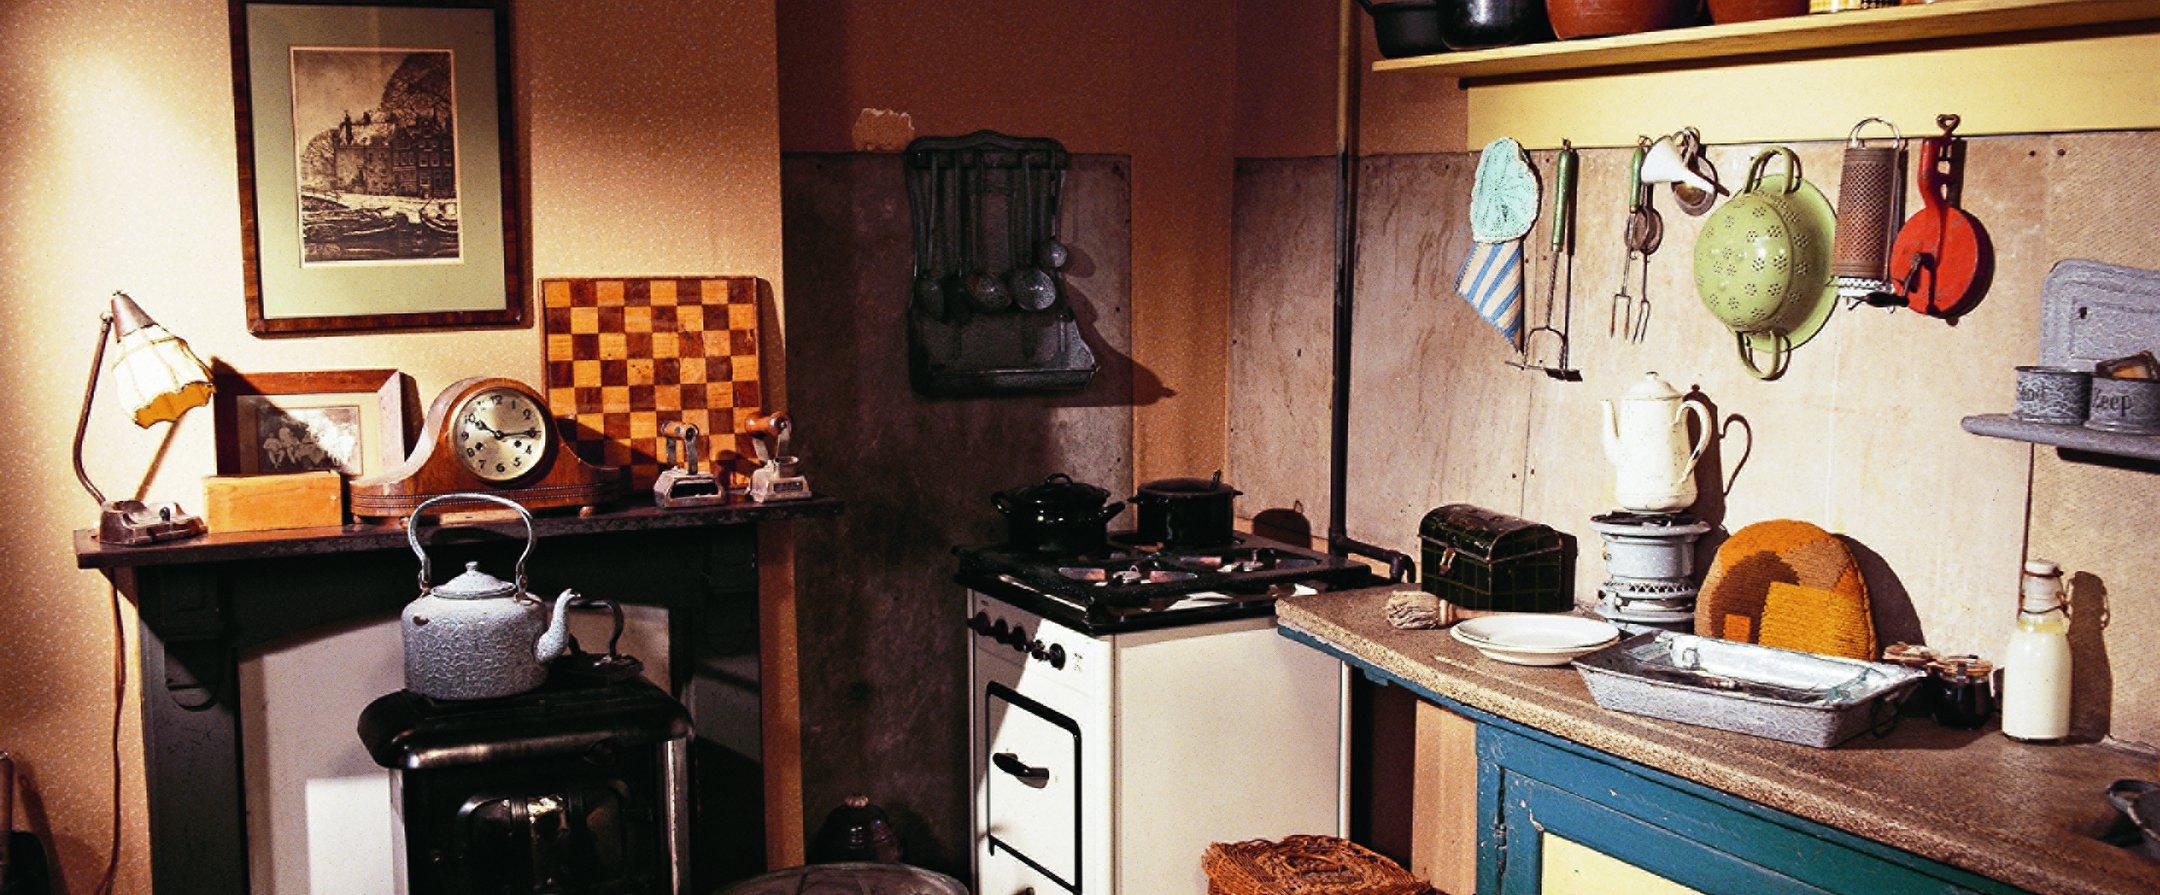 Ein Tag im Hinterhaus  Anne Frank Haus